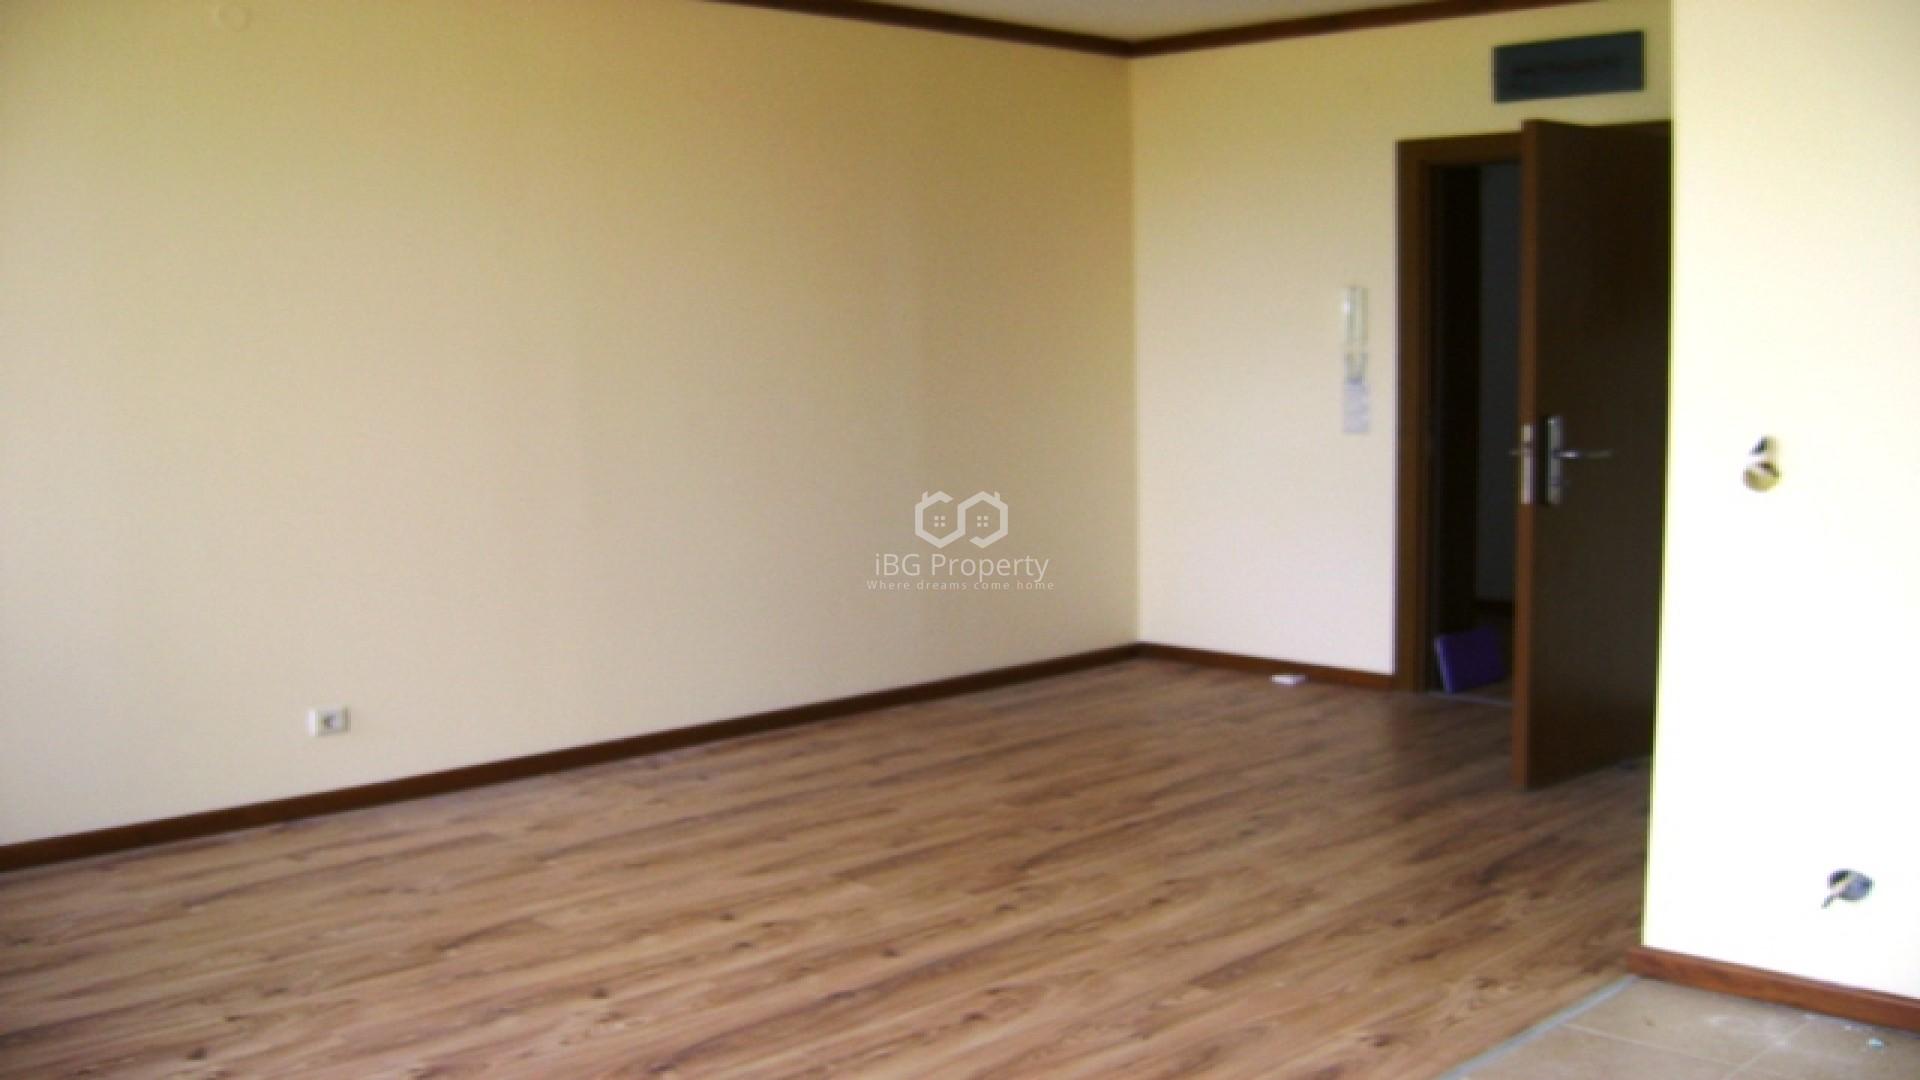 Однокомнатная квартира Банско 41 m2